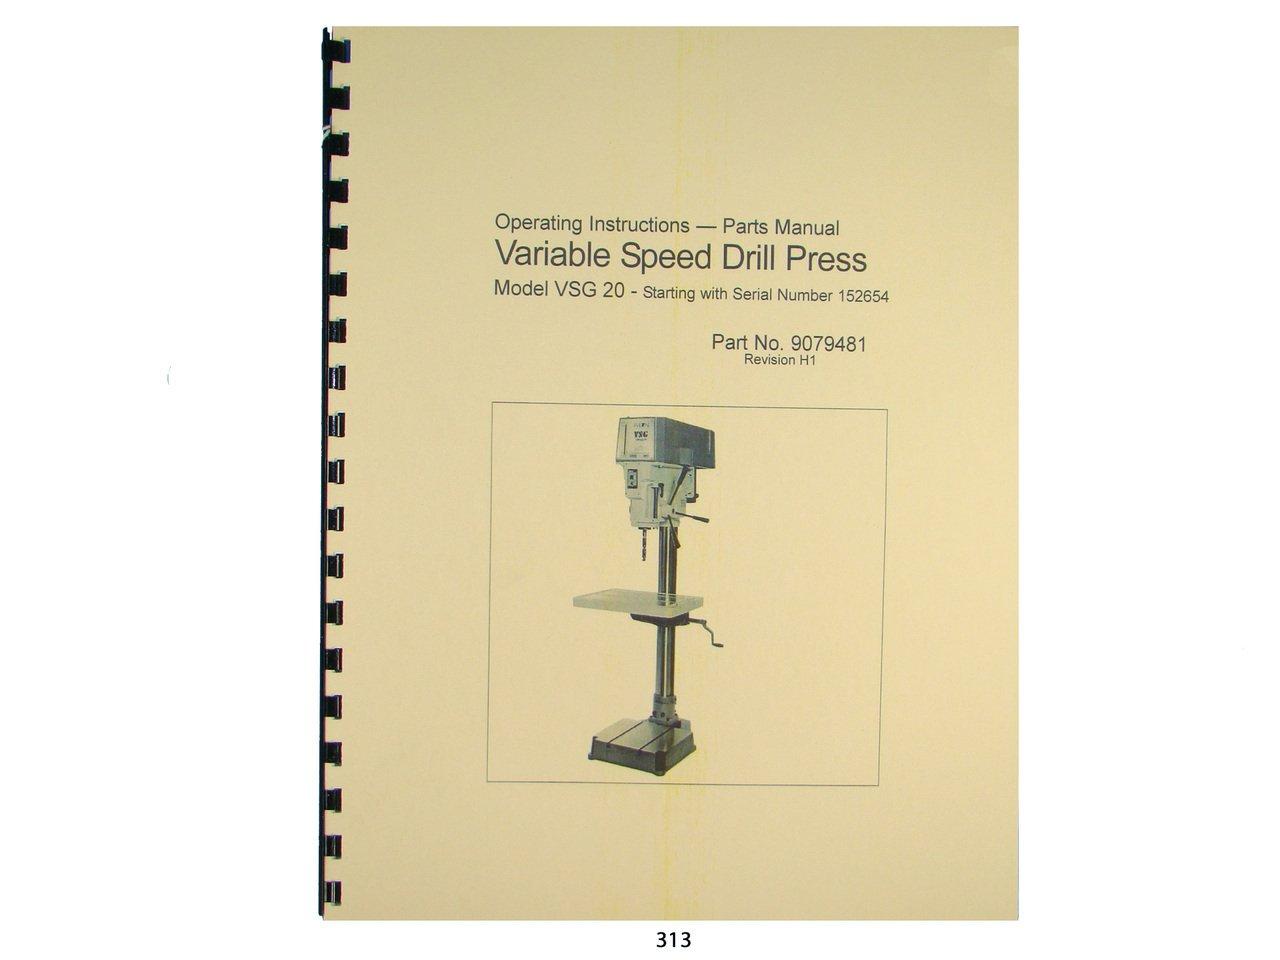 Wilton Model VSG-20 Variable Speed Drill Press Op Instruct & Parts Manual:  Wilton: Amazon.com: Books